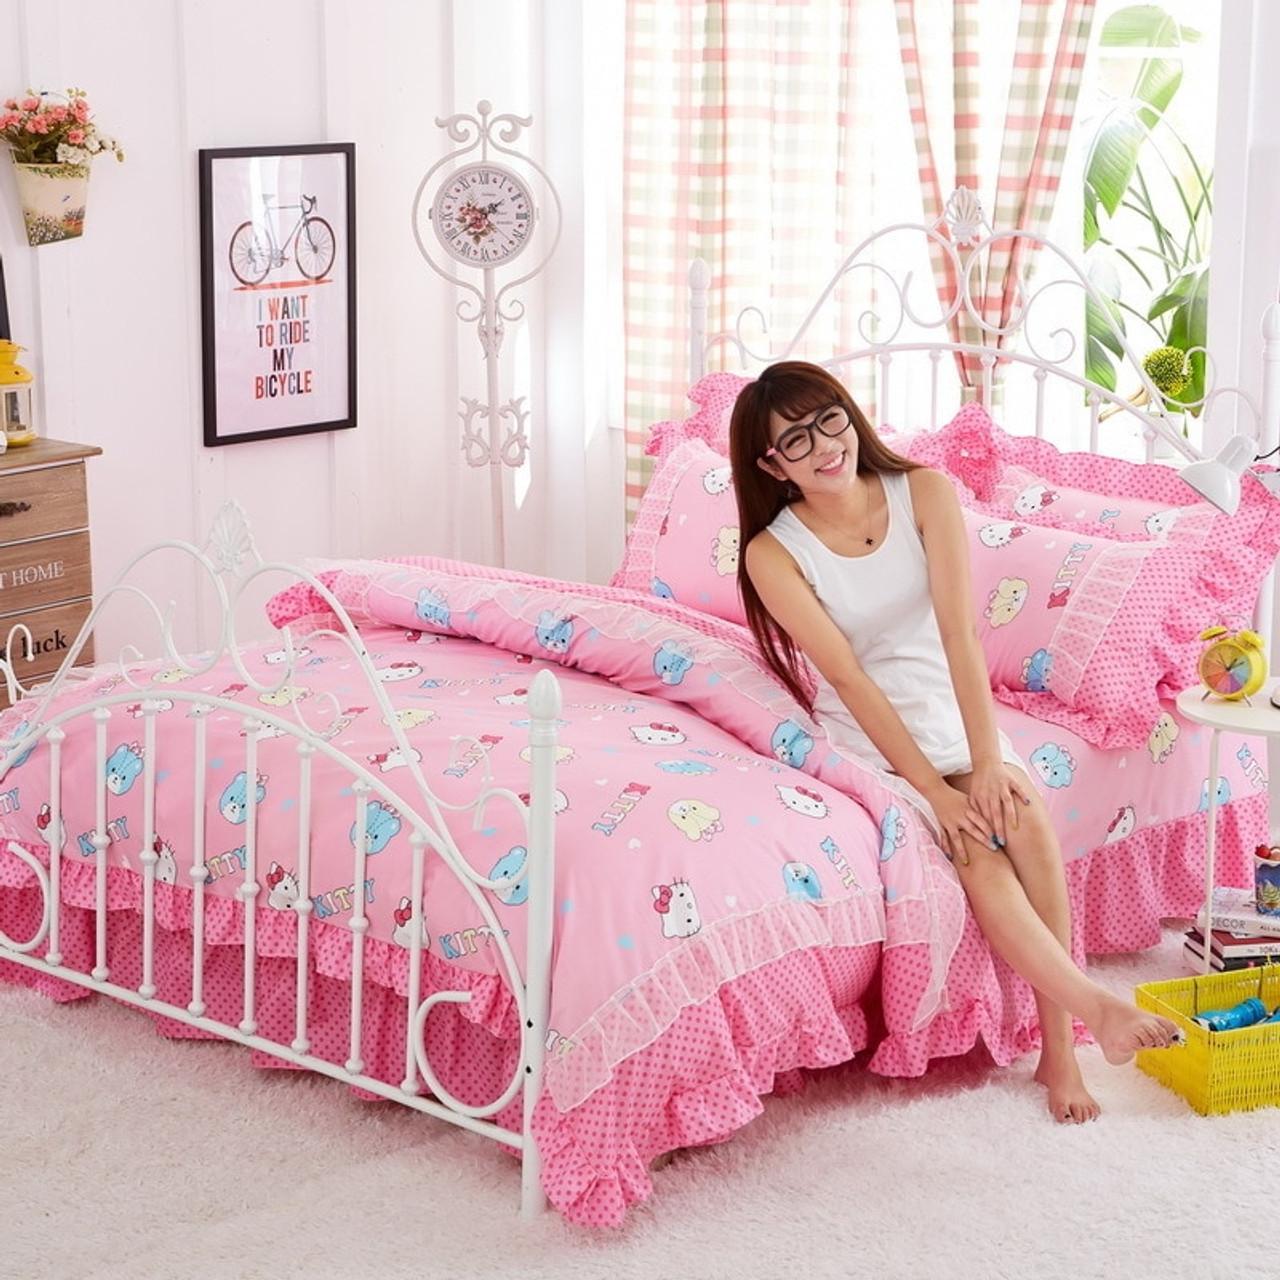 e1dfef61e Korean style pink Bedding Sets Cartoon Hello Kitty 4pcs Bed Set Duvet Cover  Bed Sheet Pillowcase ...